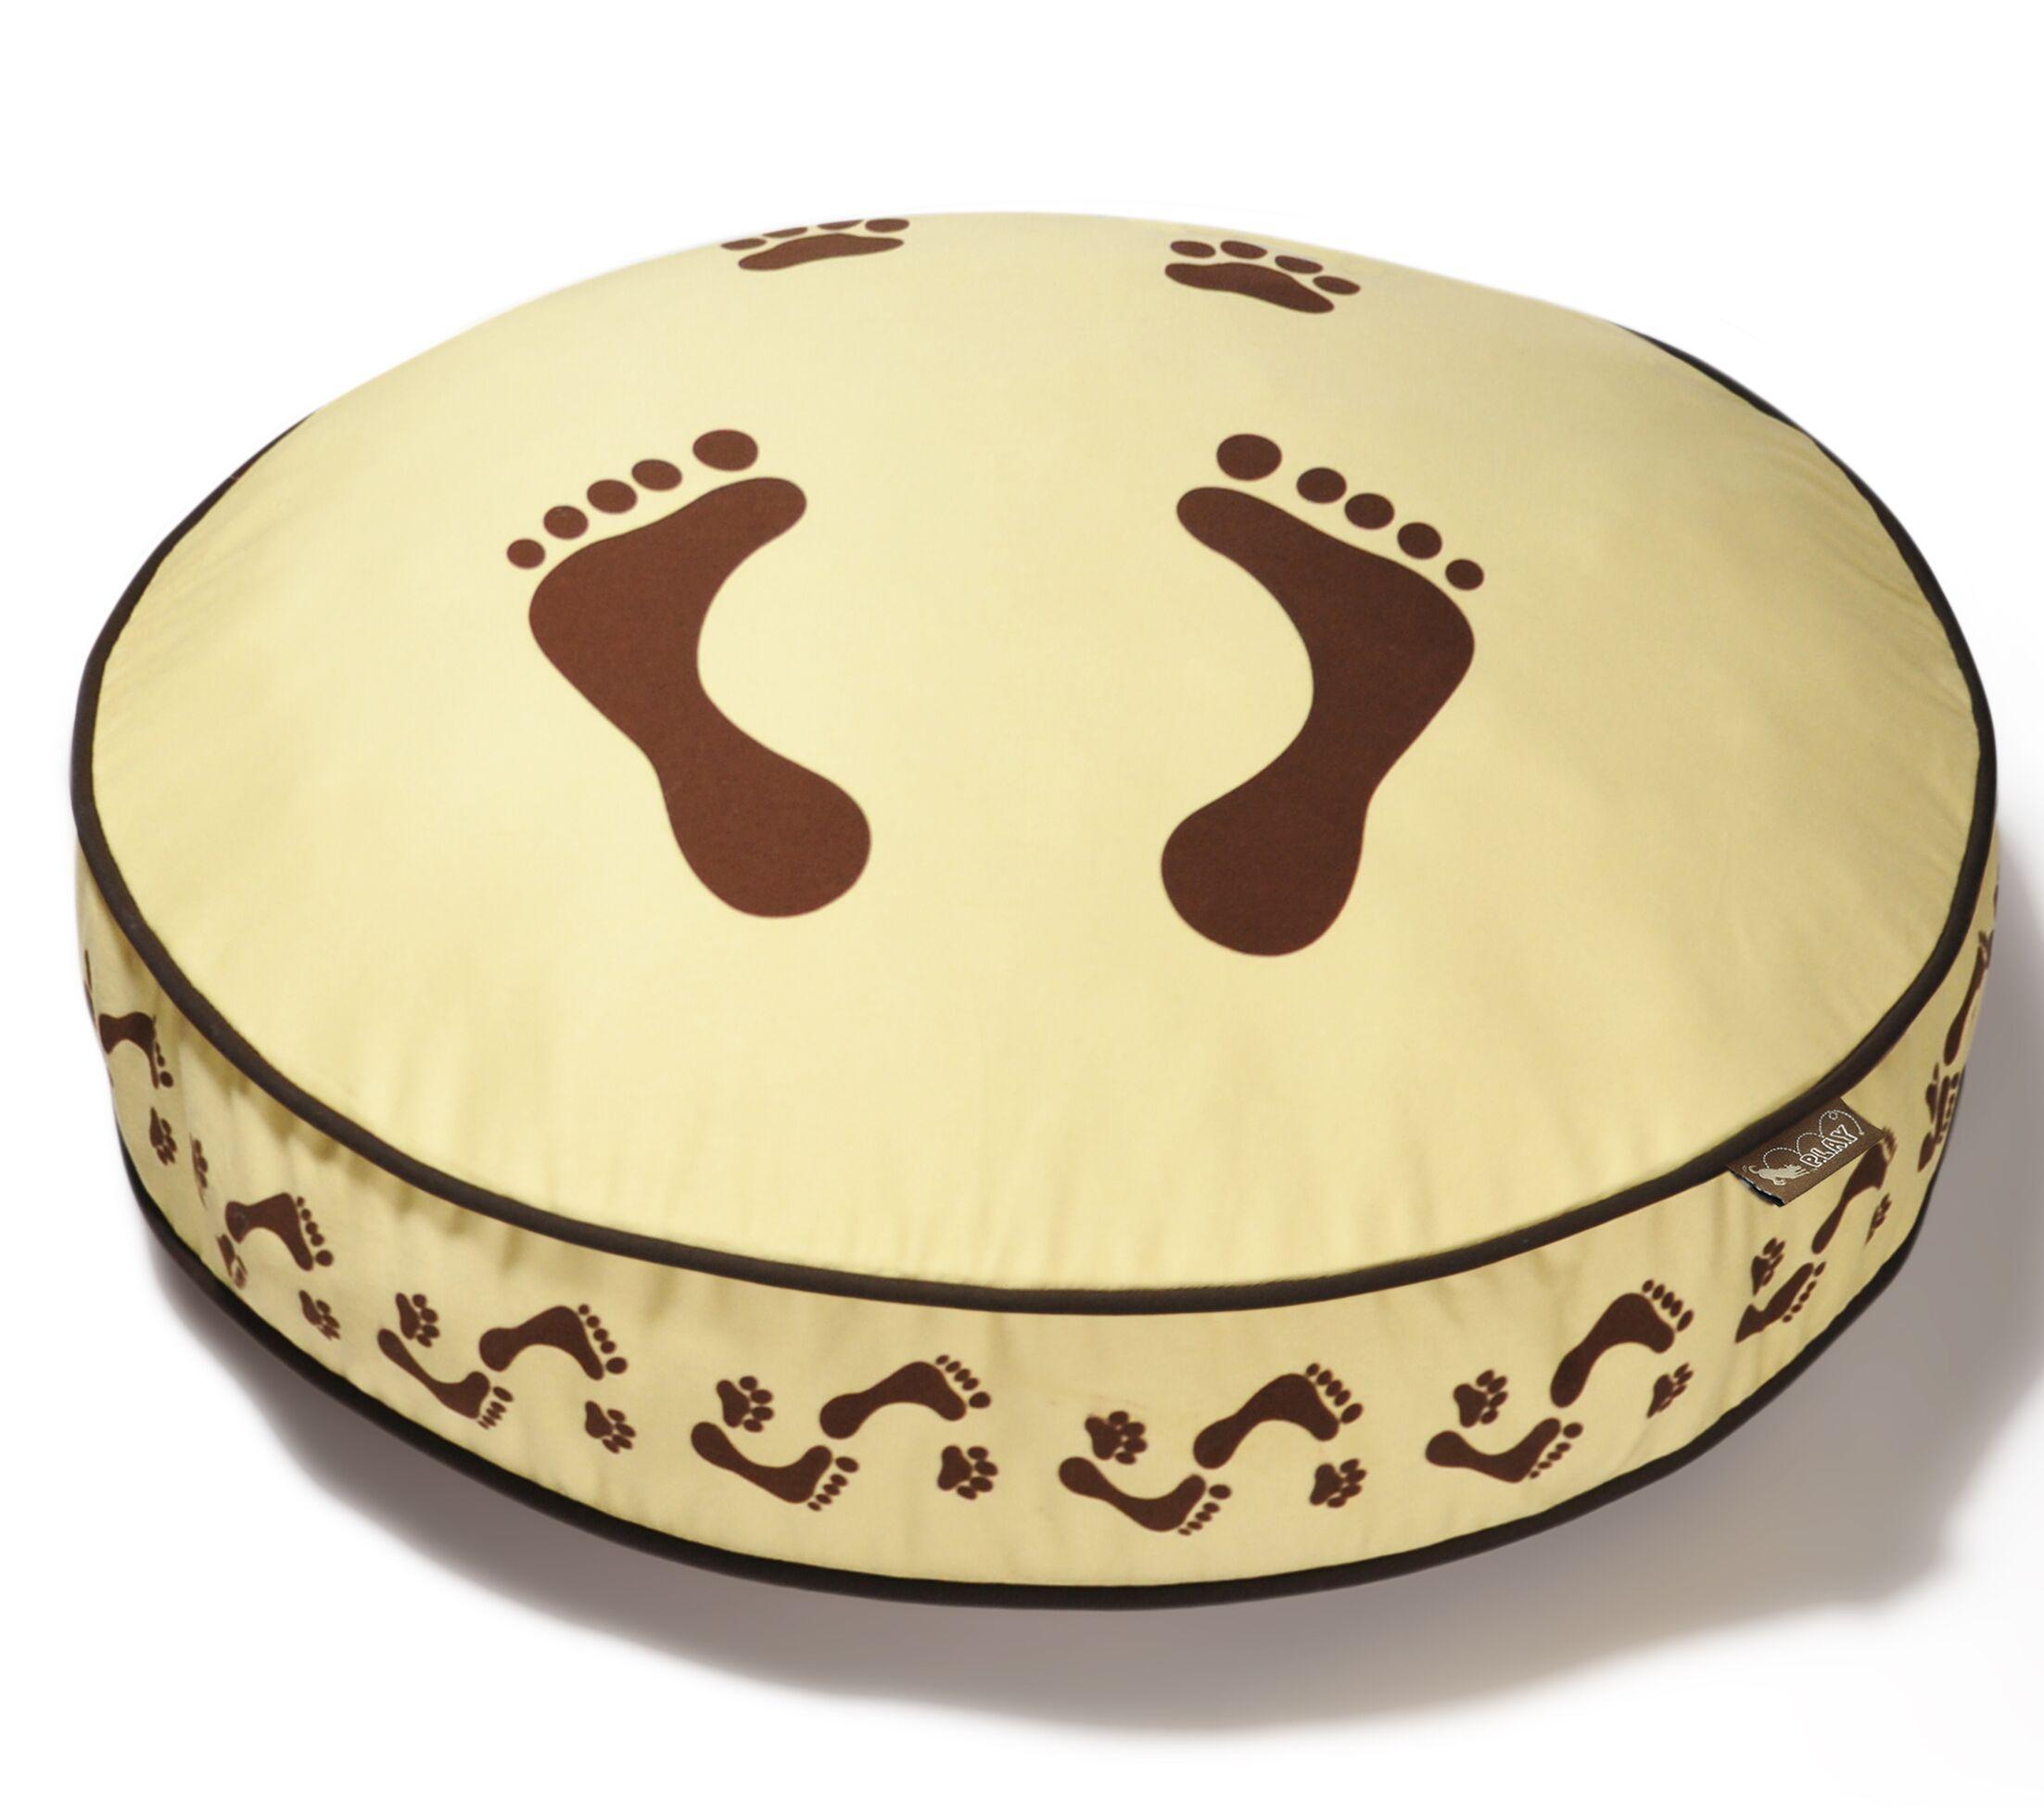 Utopian Footprints Round Change-a-Cover Size: Medium - 36